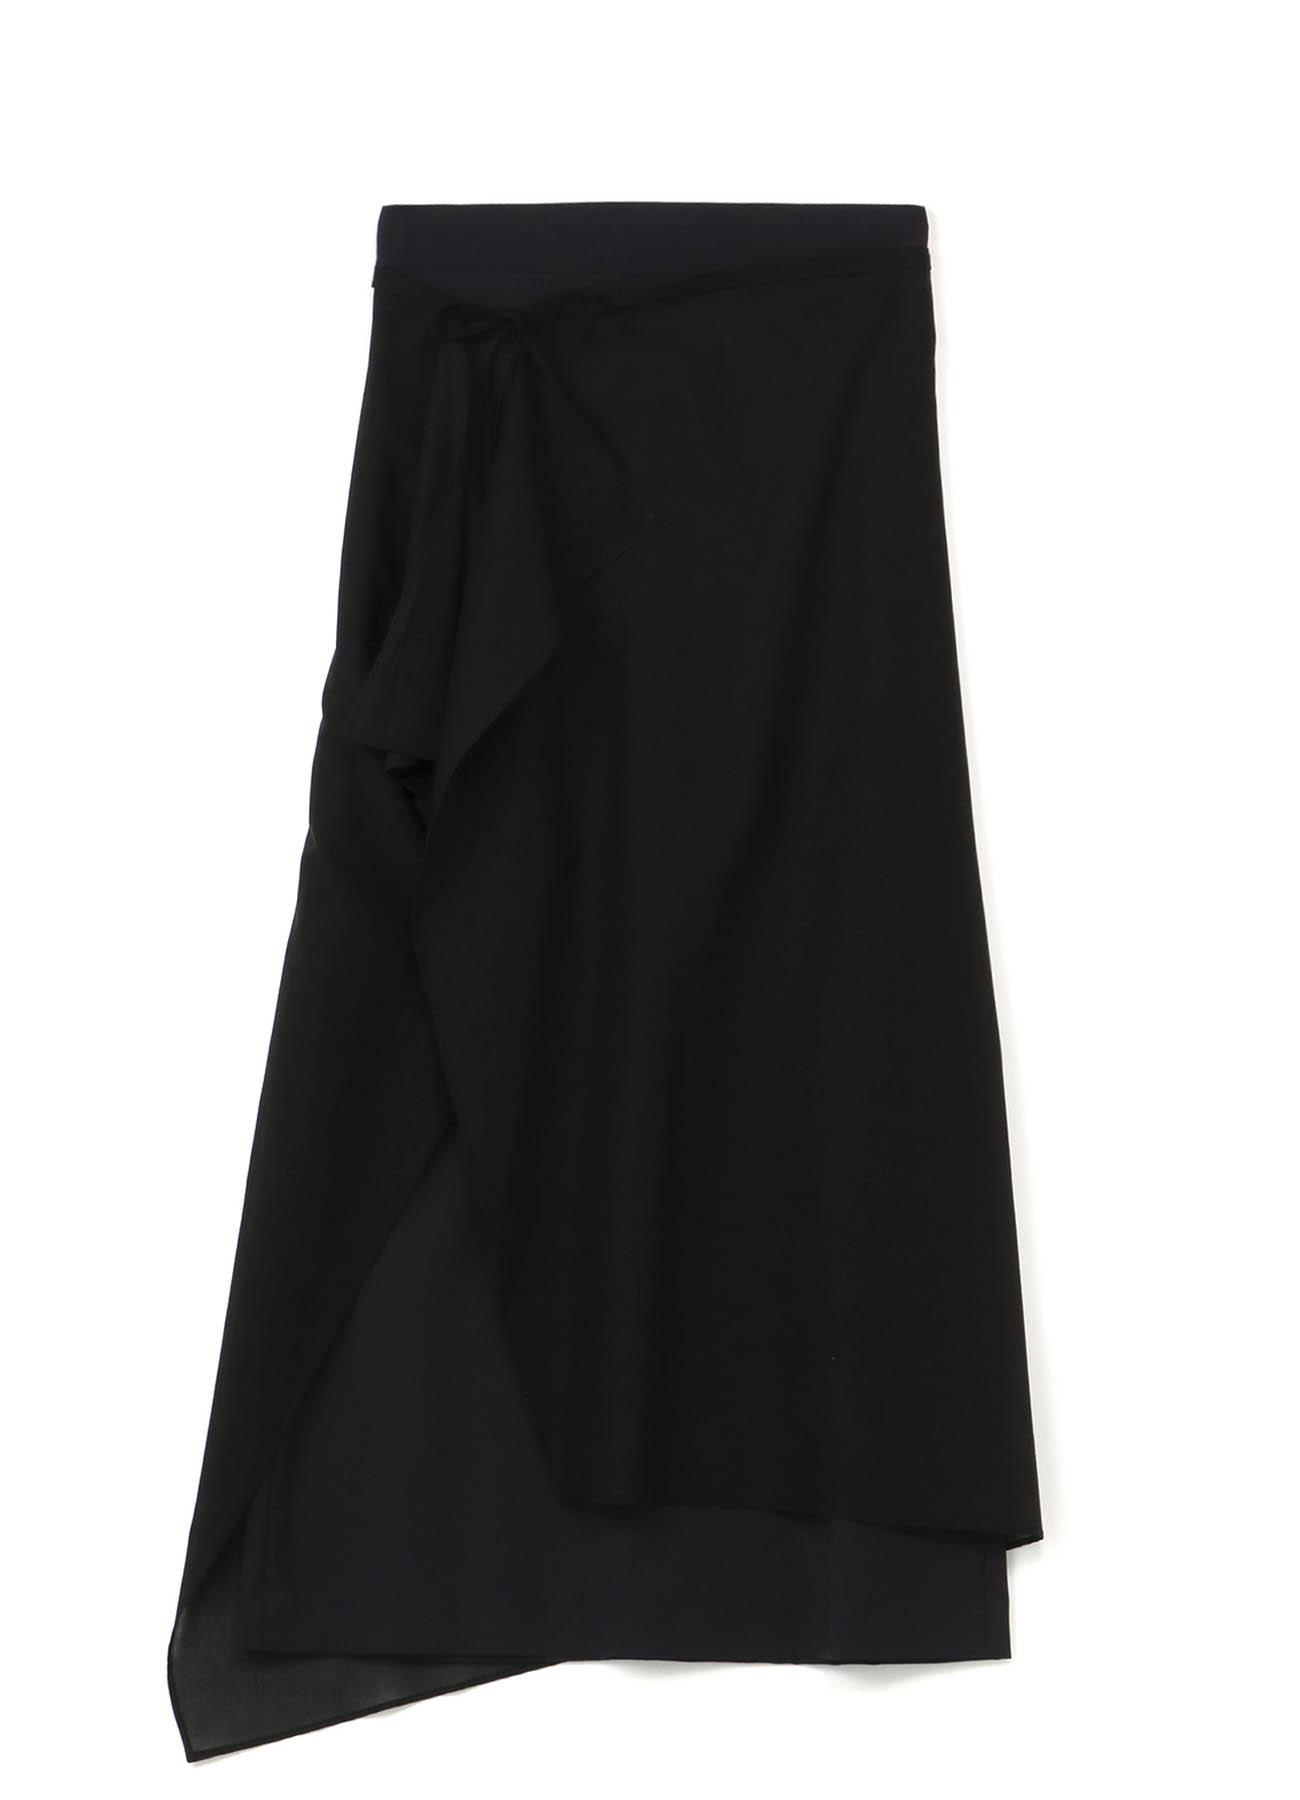 Y'sPINK 夏季羊毛可拆卸卷裹半身裙